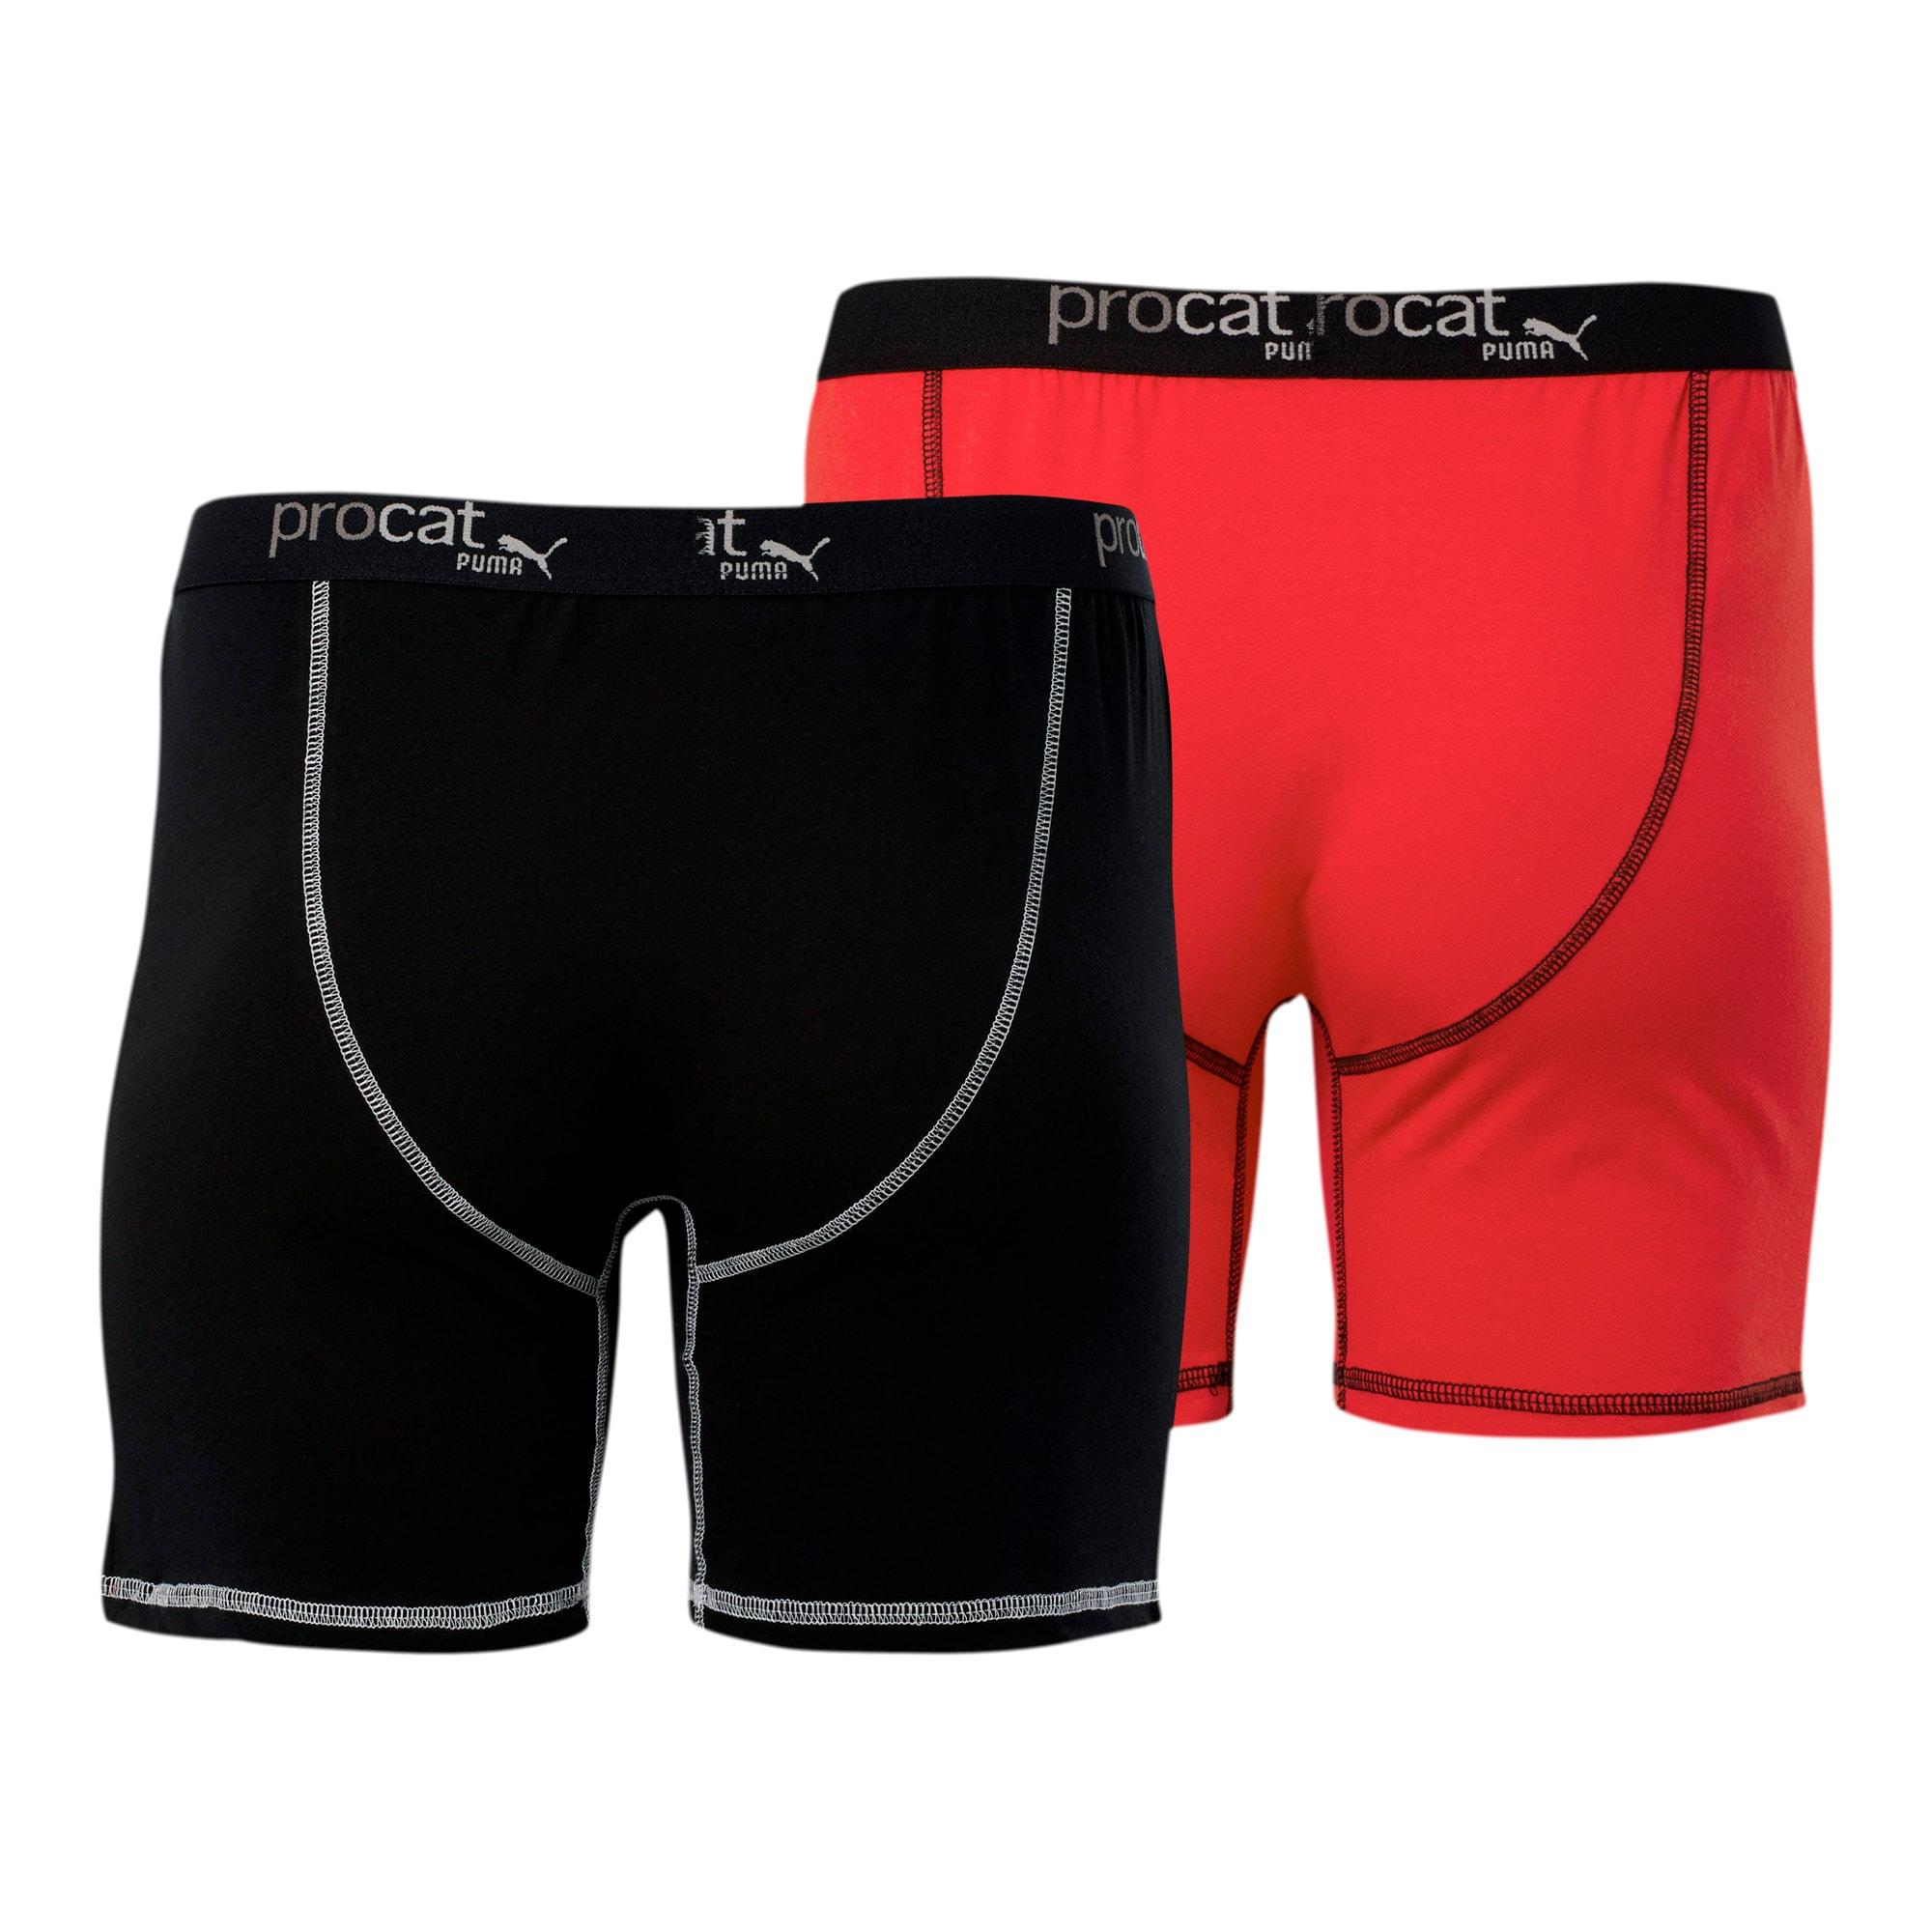 Thumbnail 2 of ProCat Men's Boxer Briefs [2 Pack], RED/BLACK, medium